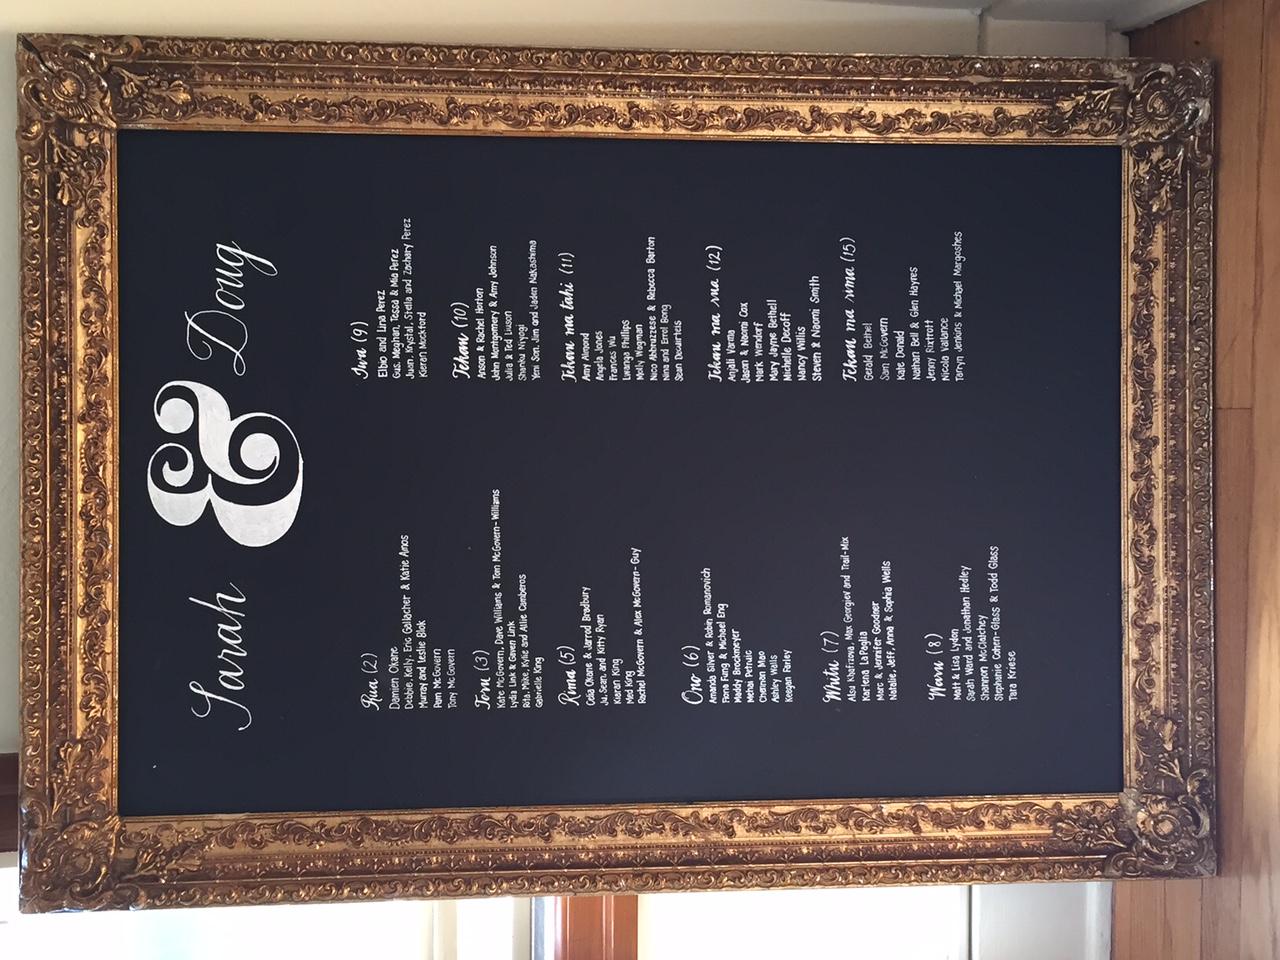 Songbird Paperie_Sarah + Doug Escort Board.JPG